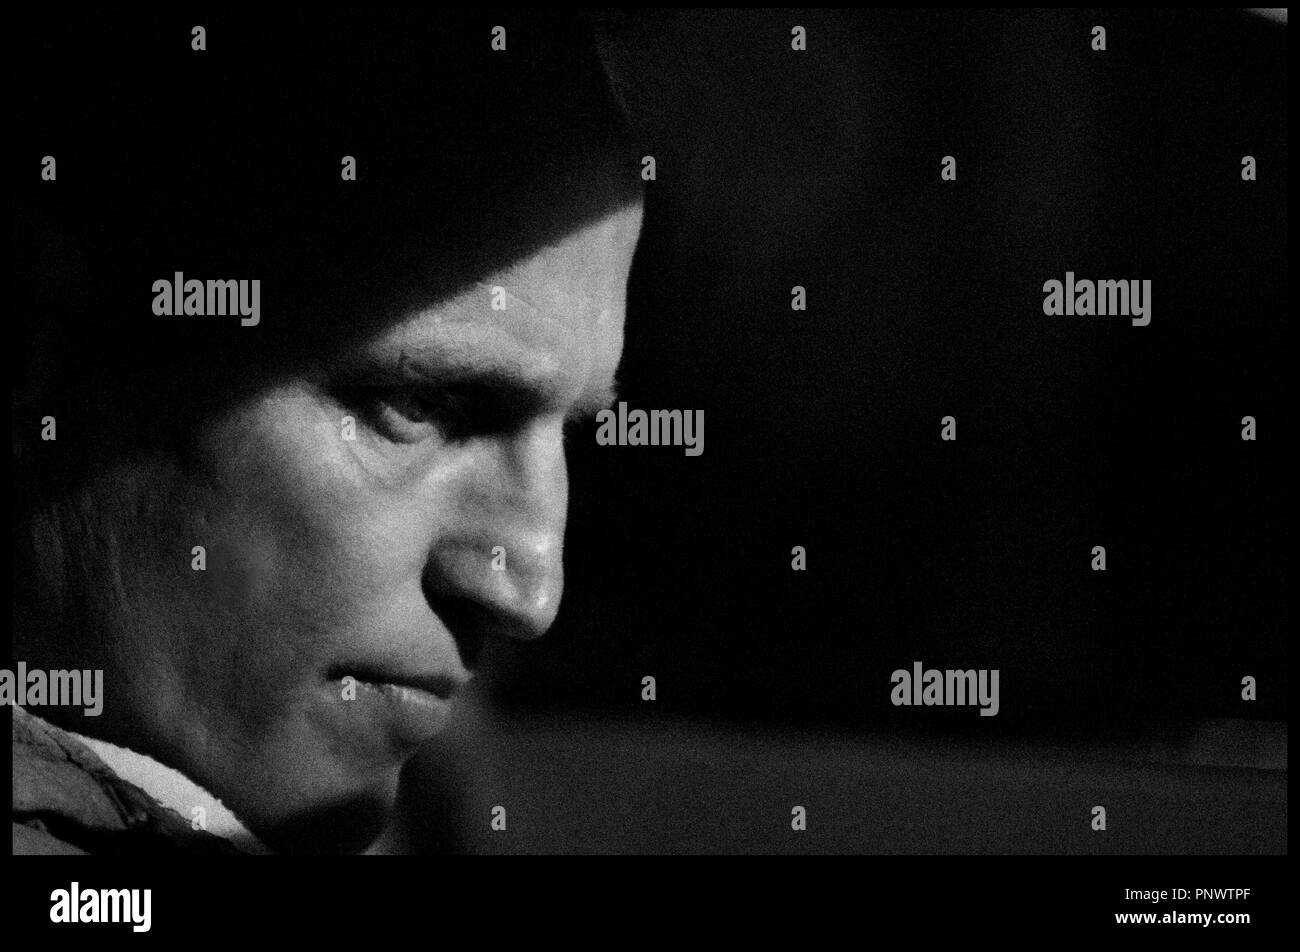 Prod DB © Lightstream Pictures - Waypoint Ent. - Third Mind Pictures - Amalgam / DR RAMPART de Oren Moverman 2011 USA avec Woody Harrelson scénario de James Ellroy - Stock Image